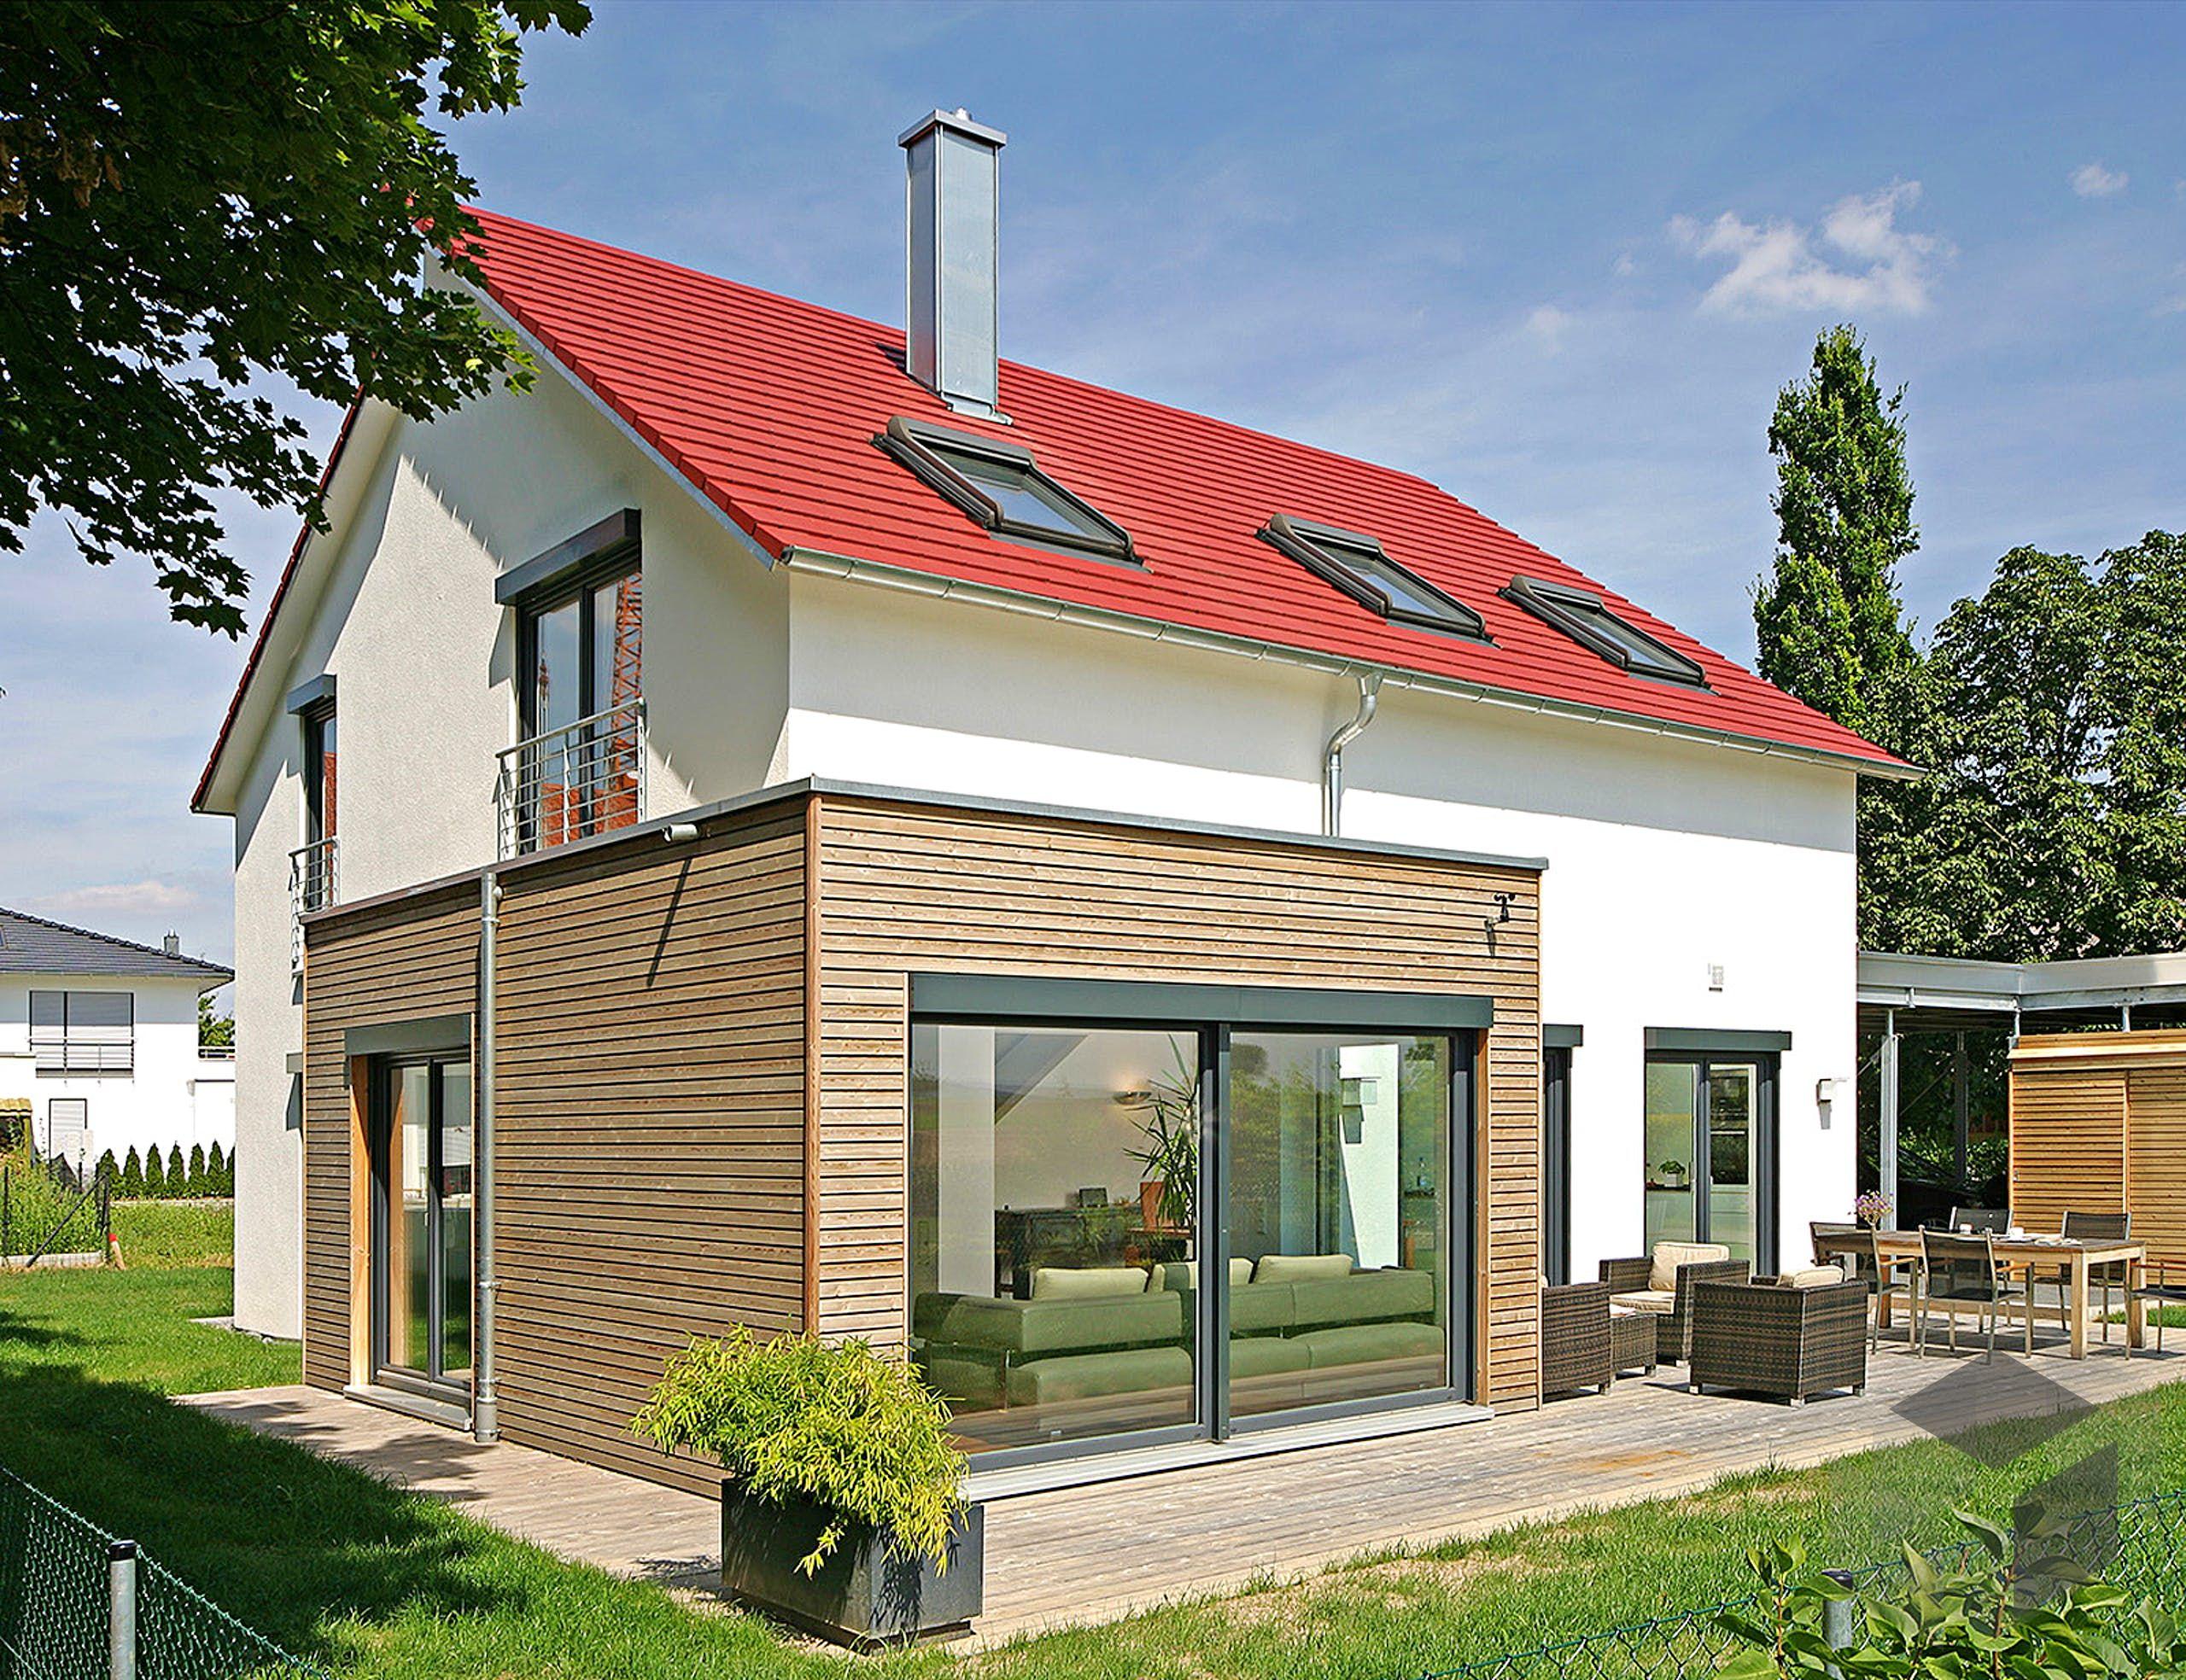 134 Modernes Haus Rotes Dach Concept M 159 Bien Zenker